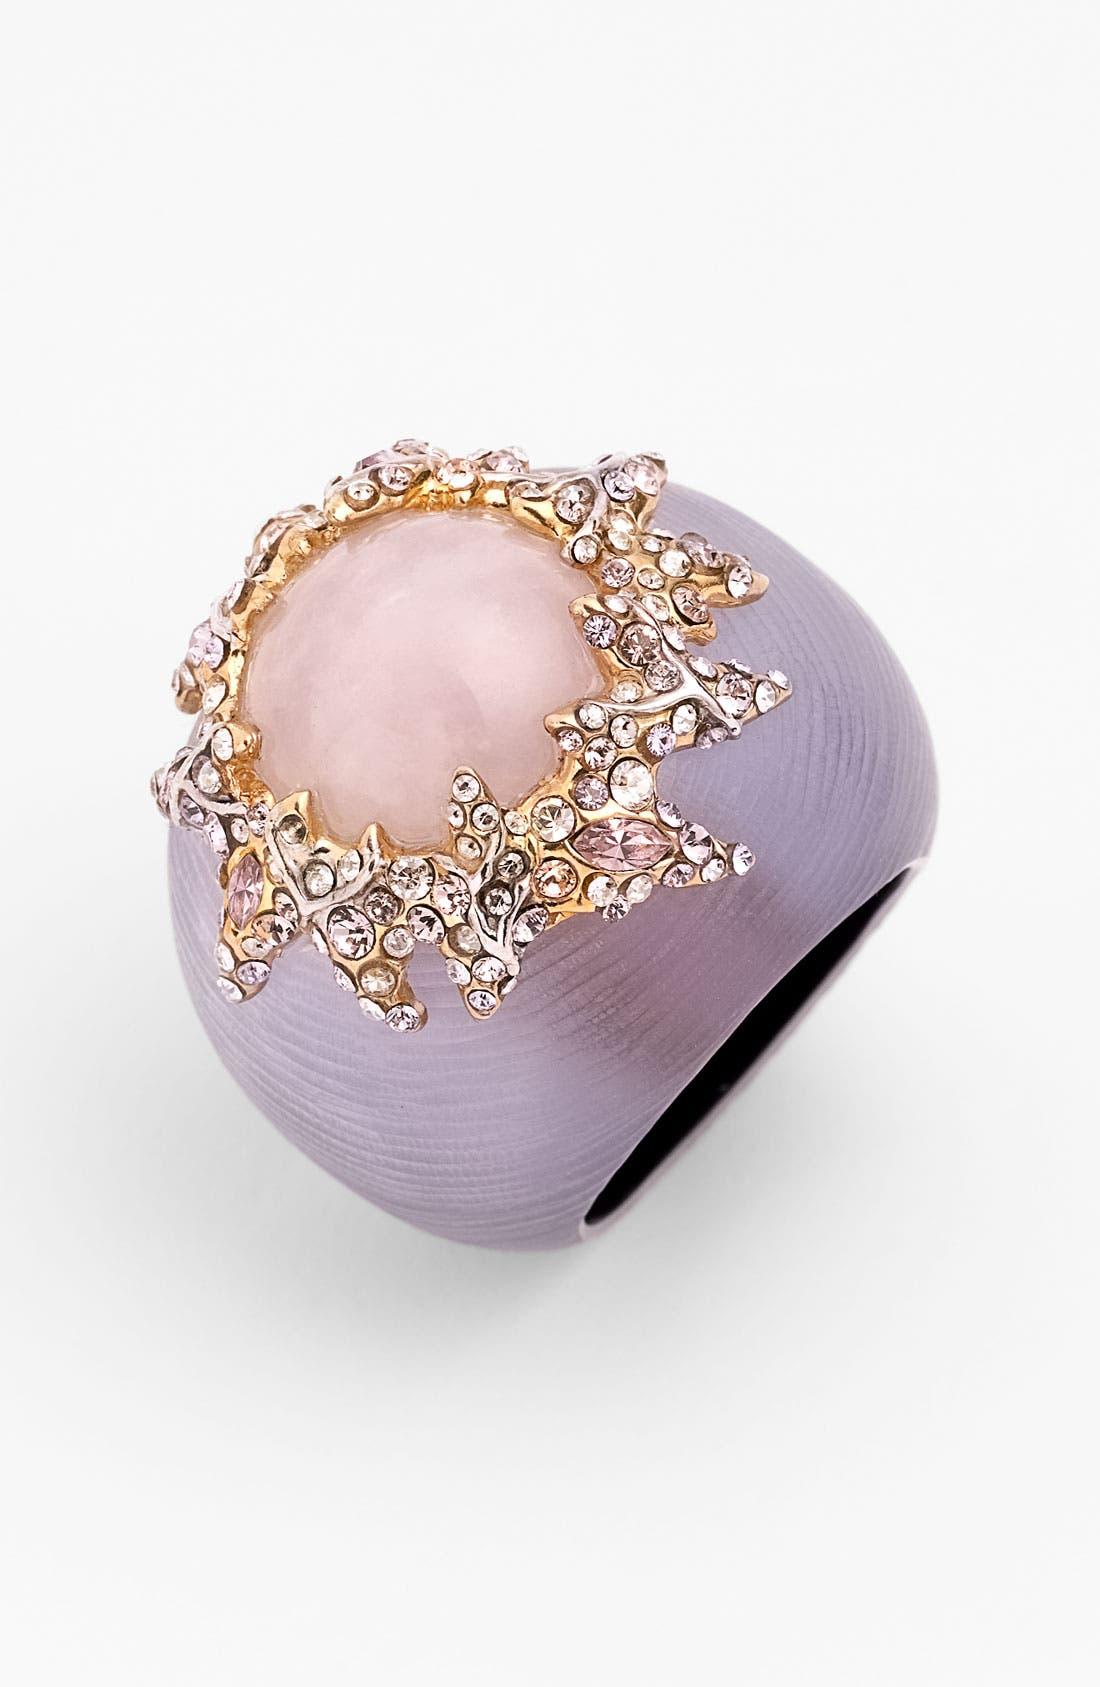 ALEXIS BITTAR,                             Rosy Ring,                             Main thumbnail 1, color,                             530